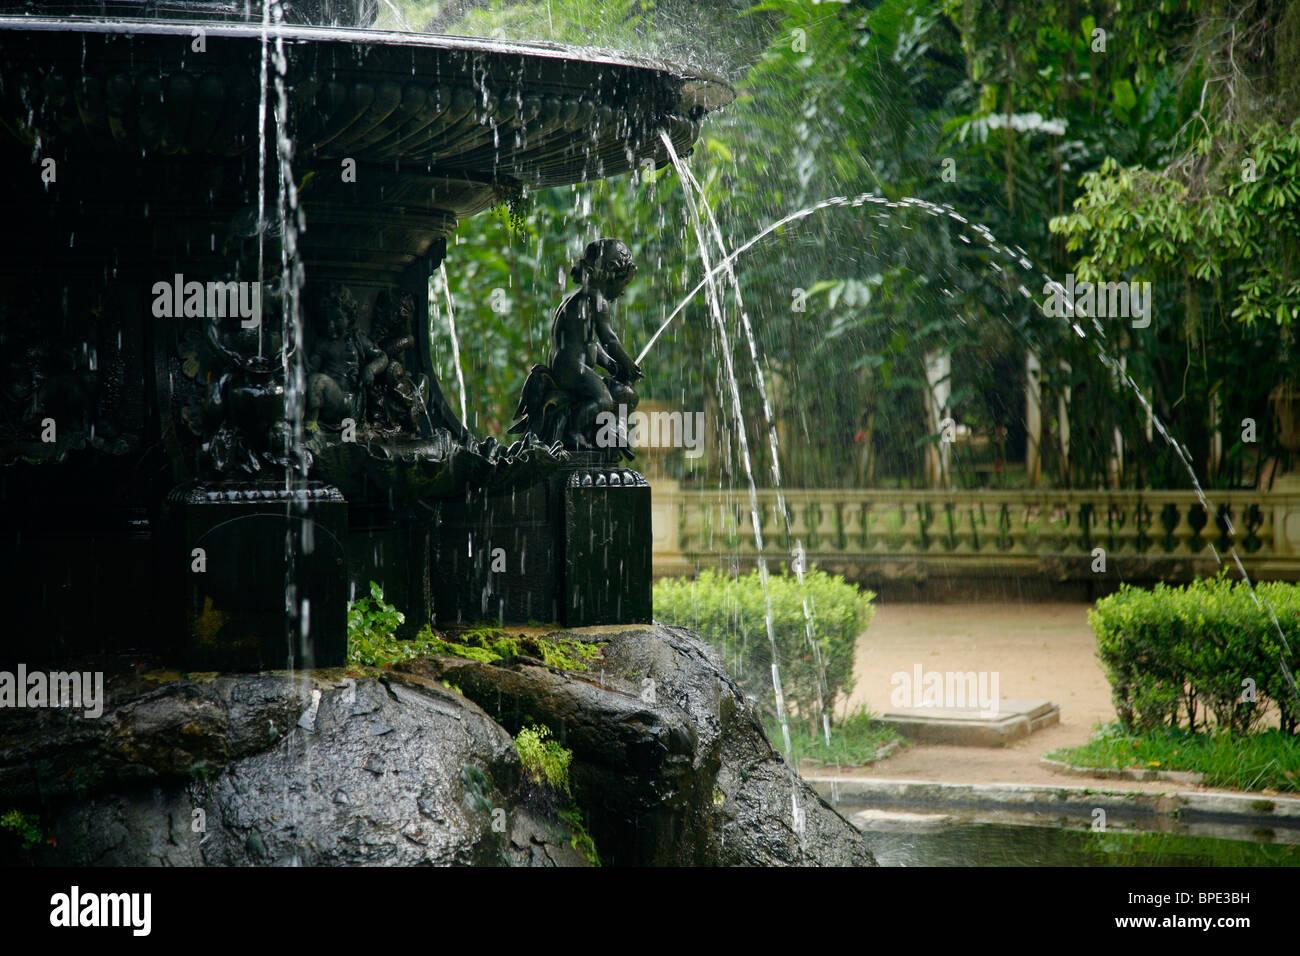 Brunnen am Jardim Botanico oder den Botanischen Garten, Rio De Janeiro, Brasilien. Stockbild